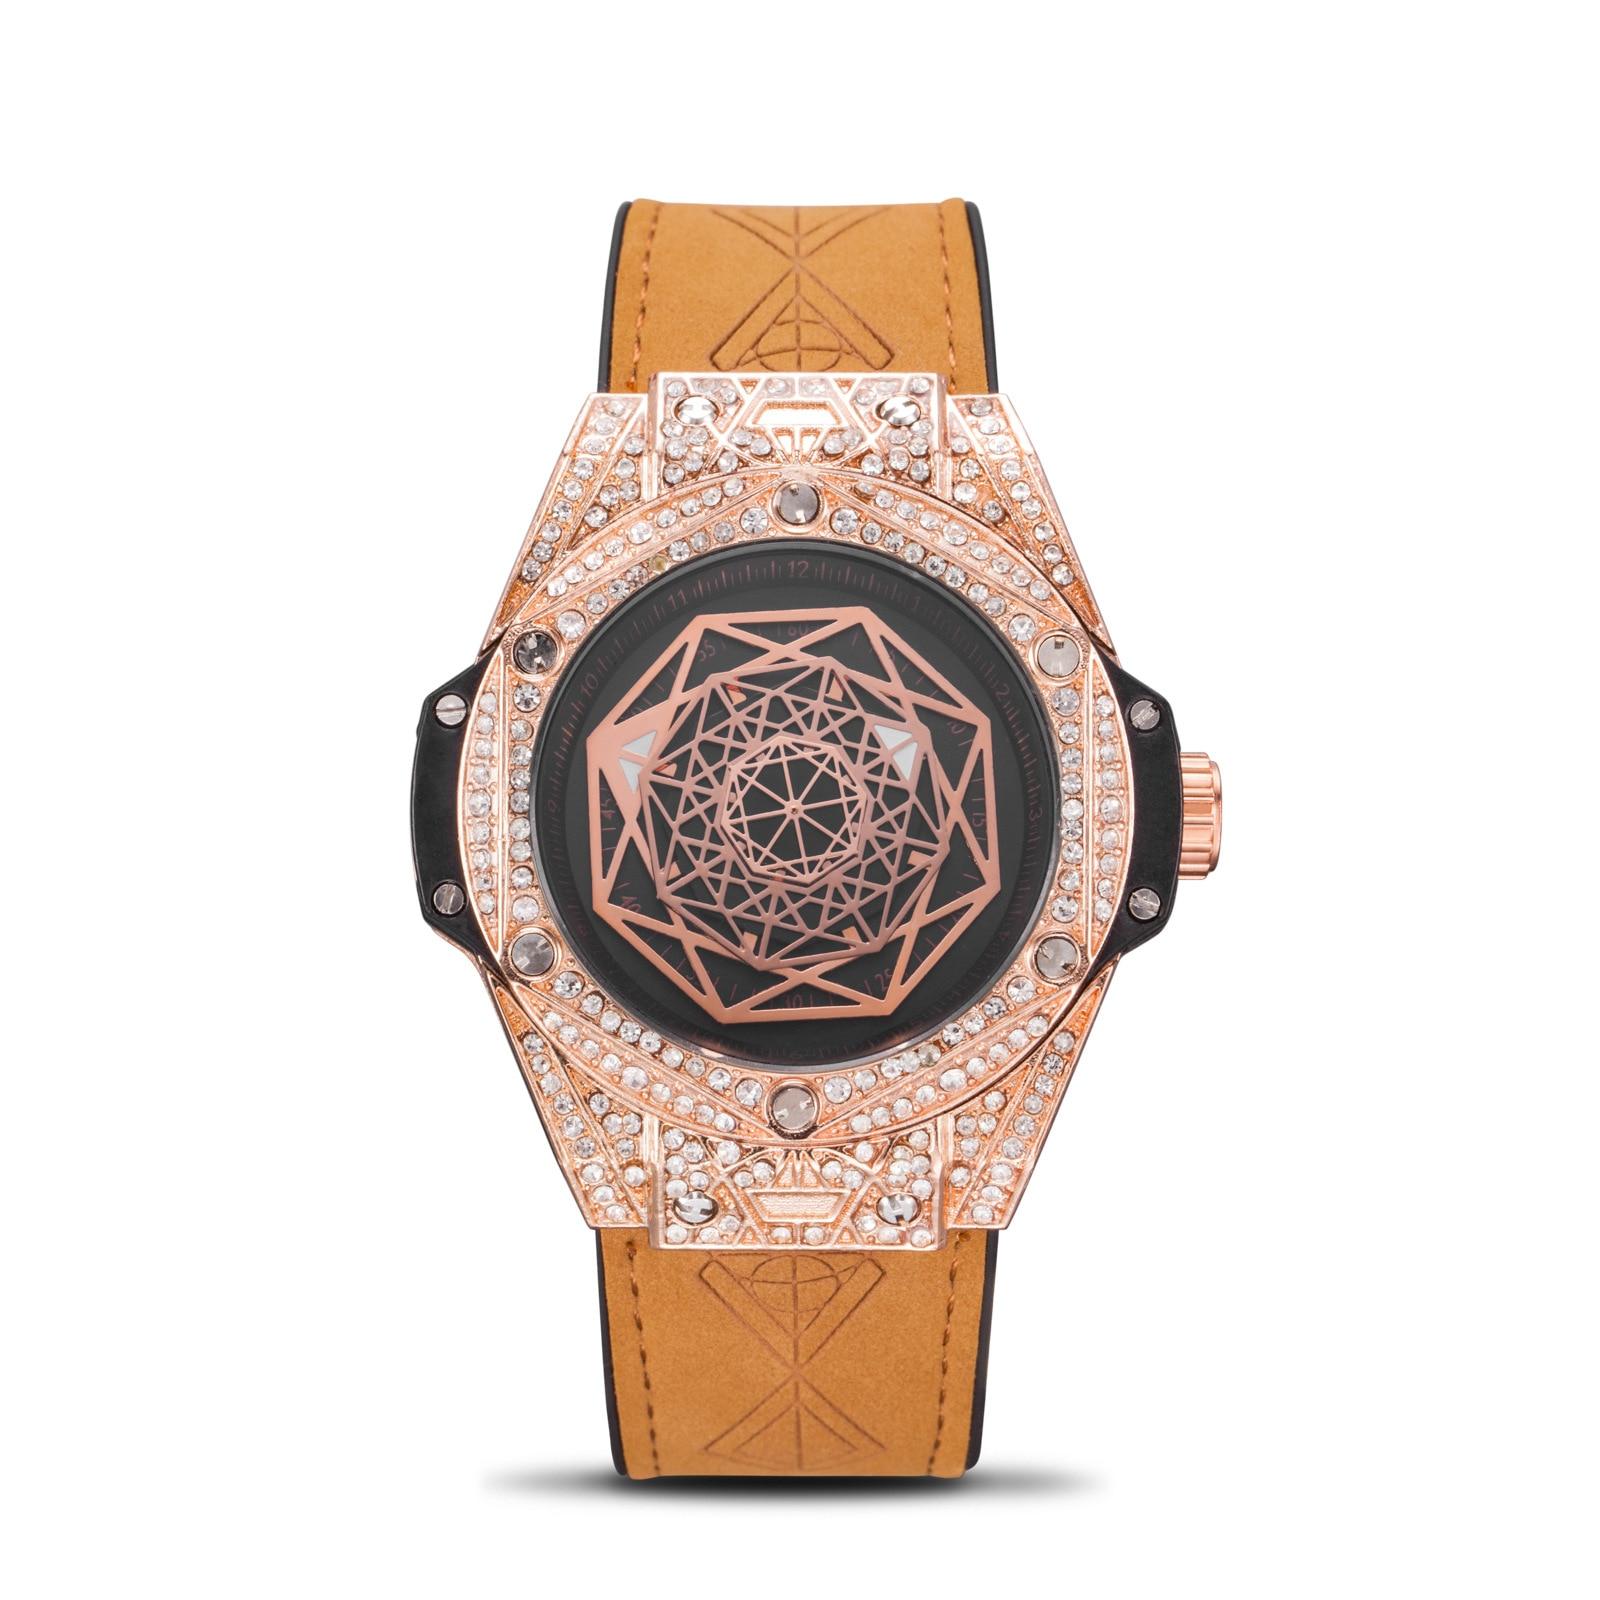 2021 New Diamond Mens Watches Top Brand Leather Chronograph Waterproof Sport Quartz Watch For Men Clock Gift Relogio Masculino